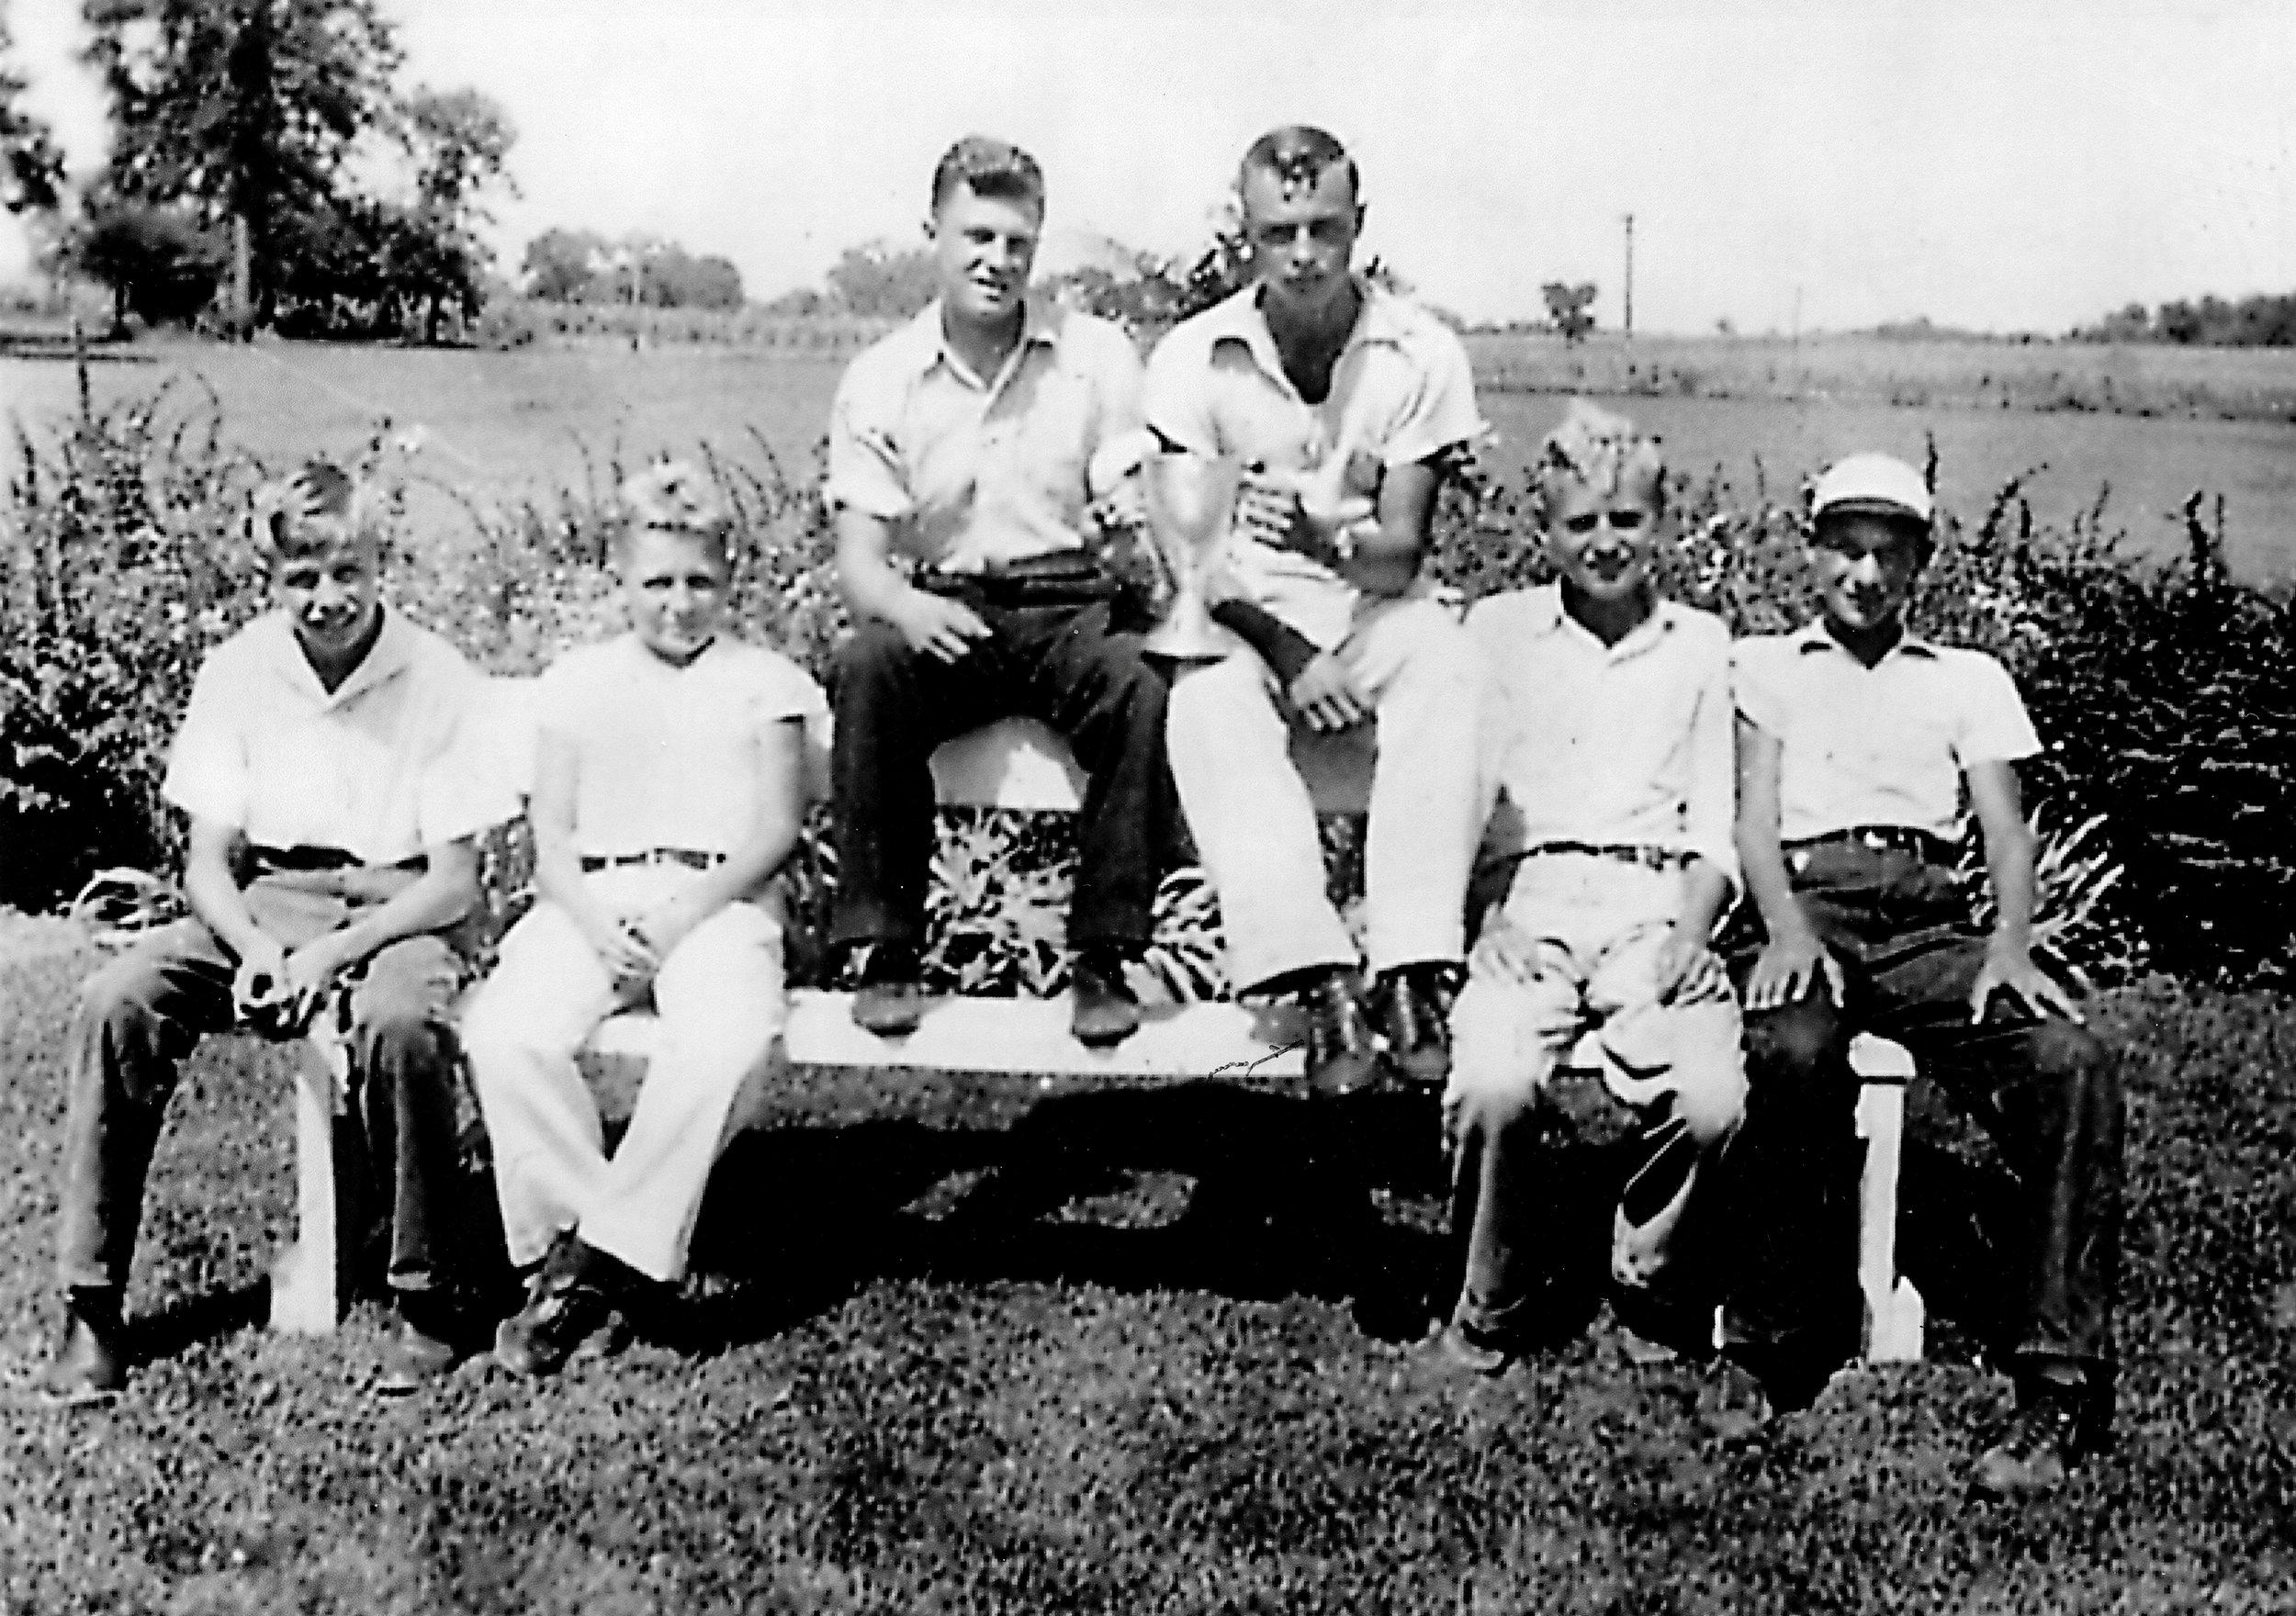 JPG WCC Caddies 1936 300.jpg